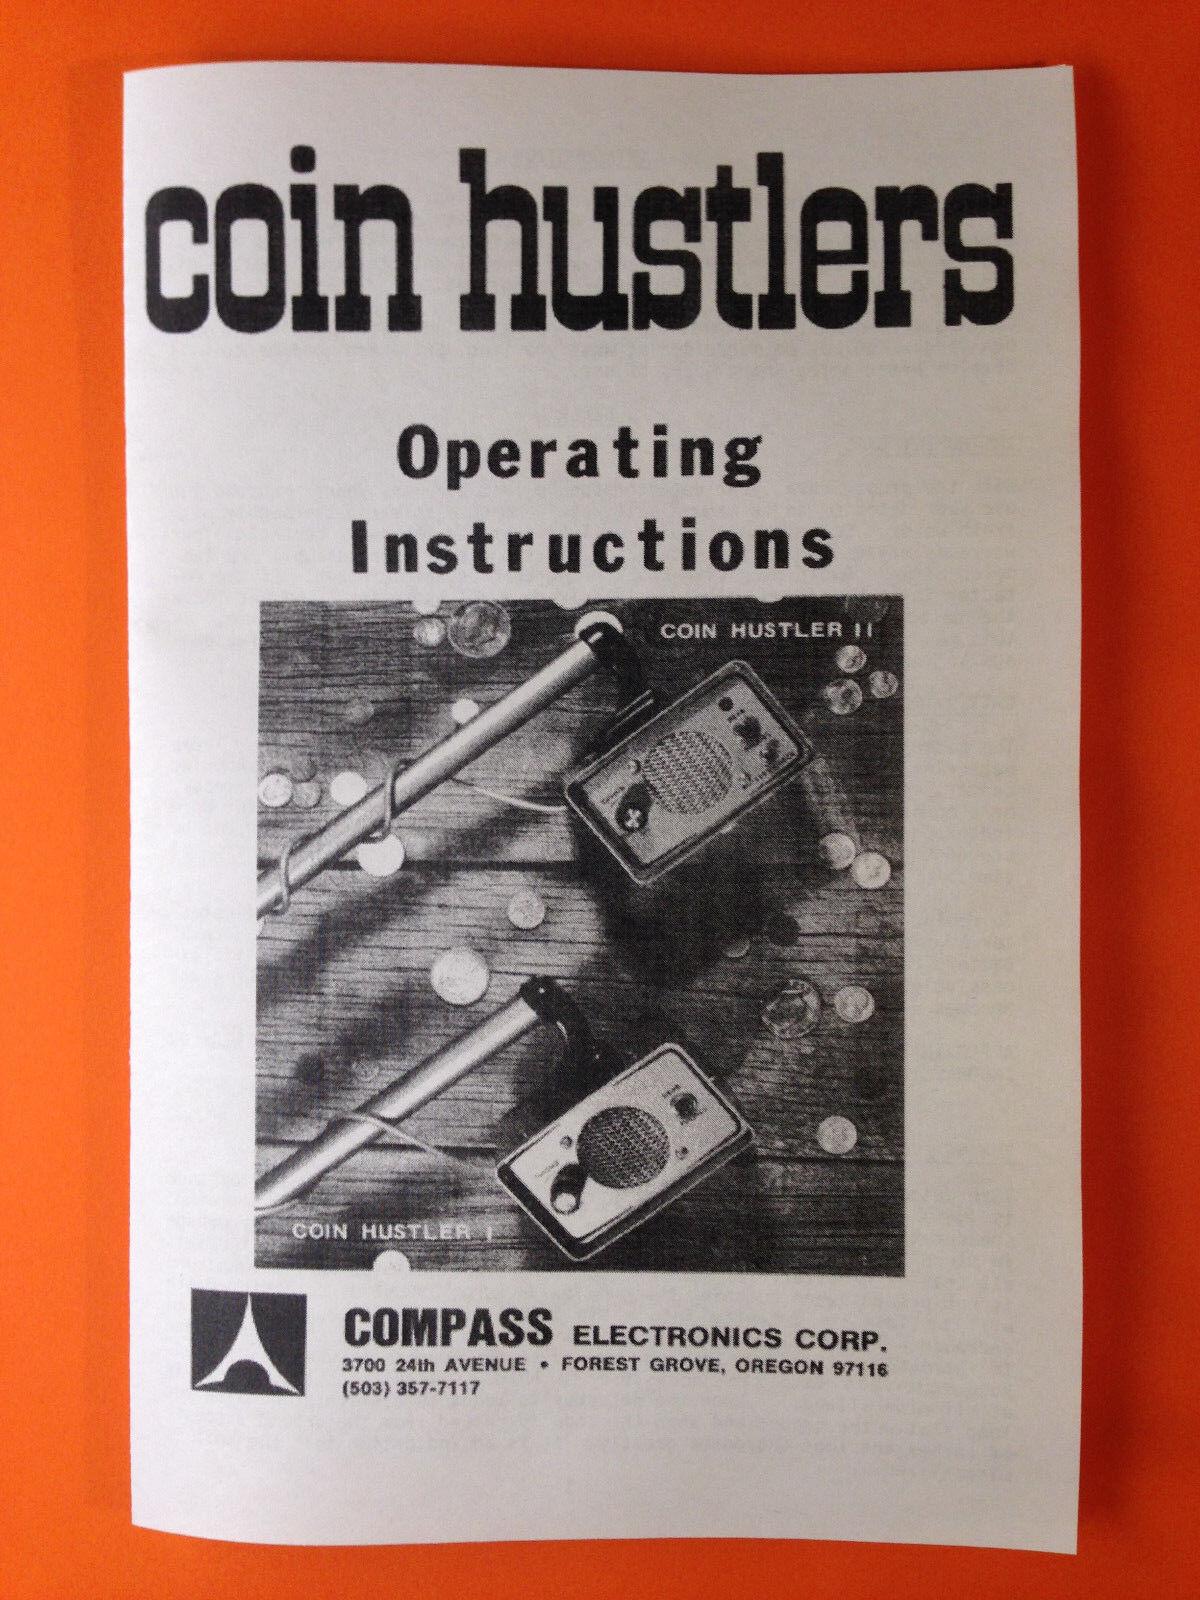 Compass Metal Detector Operating Instruction Coin Hustler I & II Treasure Finder